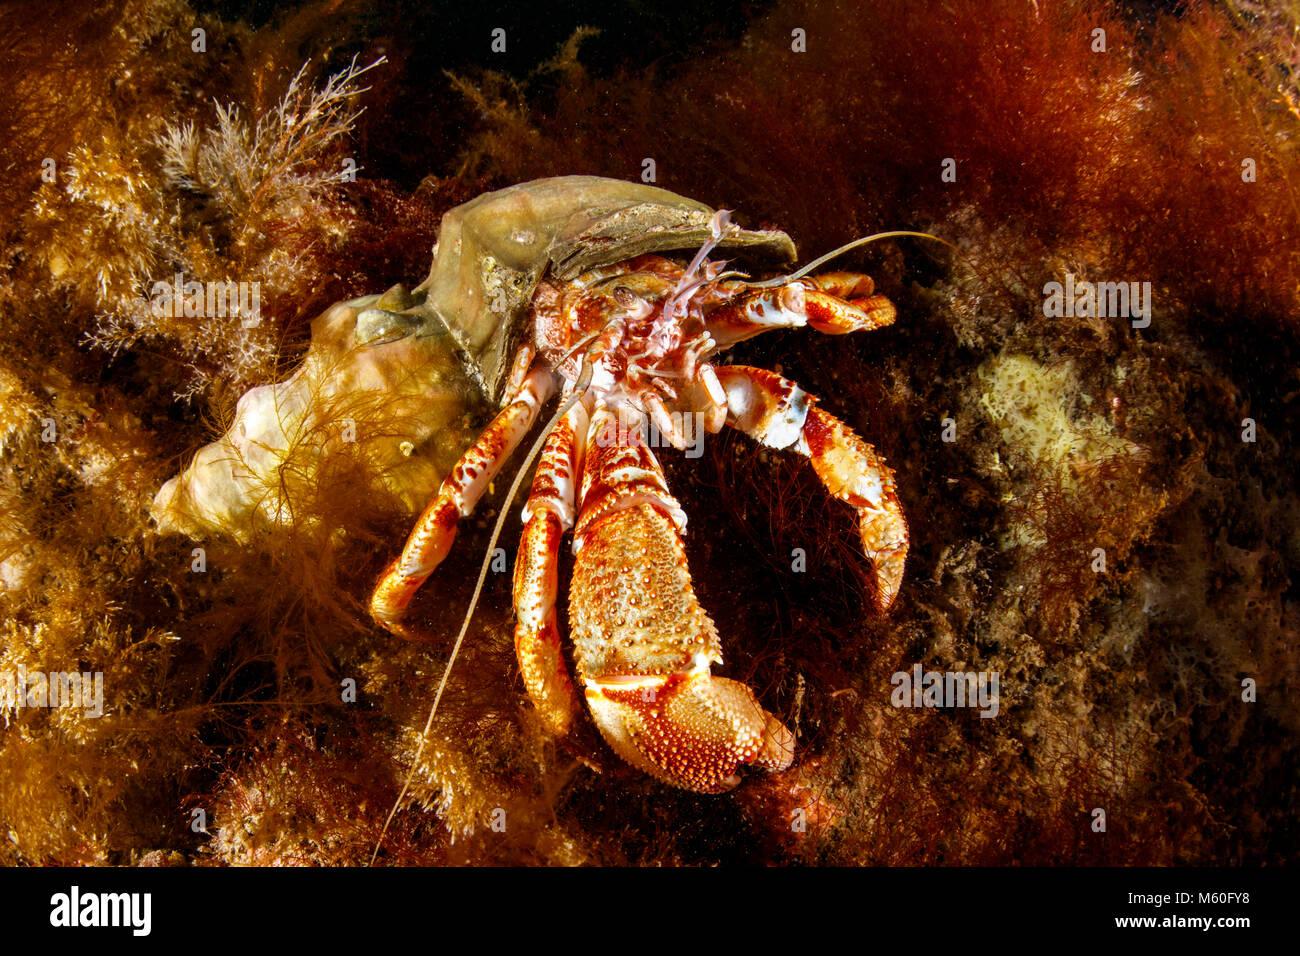 L'Ermite commun, Nord de l'océan Atlantique, l'Islande Photo Stock